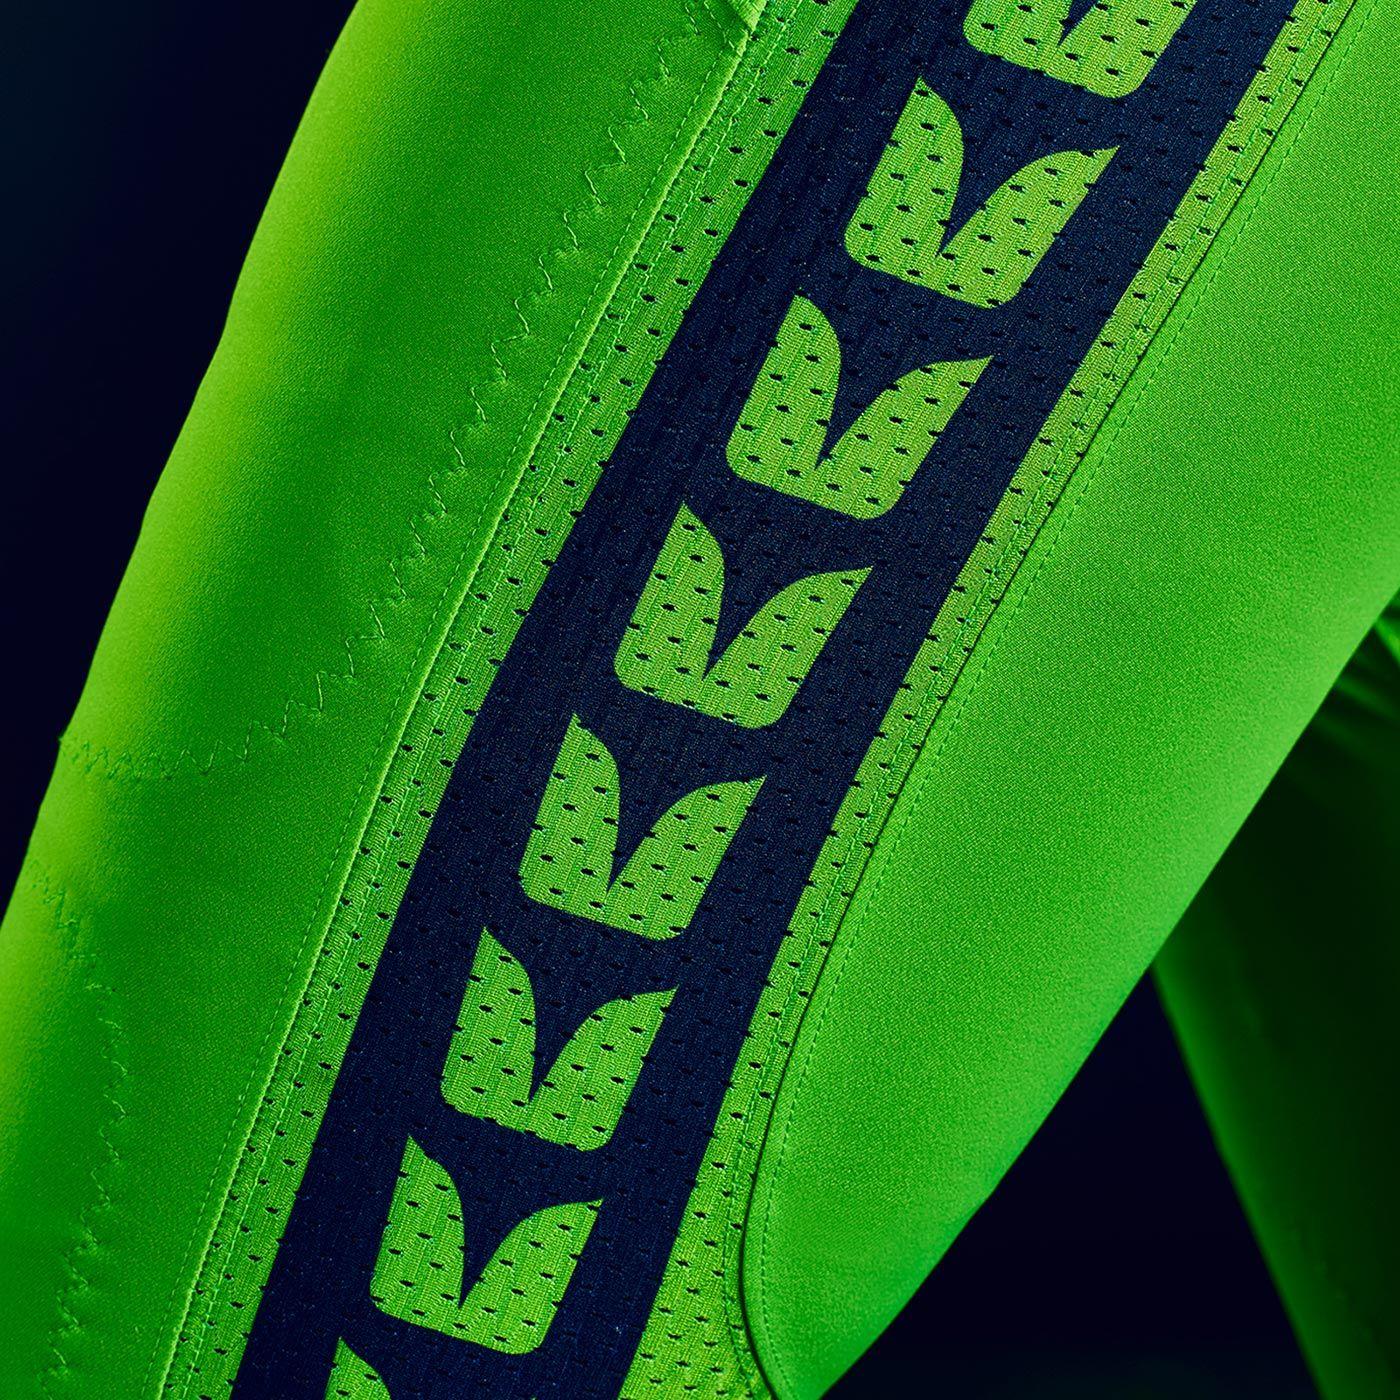 finest selection 2b81f 72609 Seattle Seahawks Action Green Uniforms | Seahawks | Seahawks ...